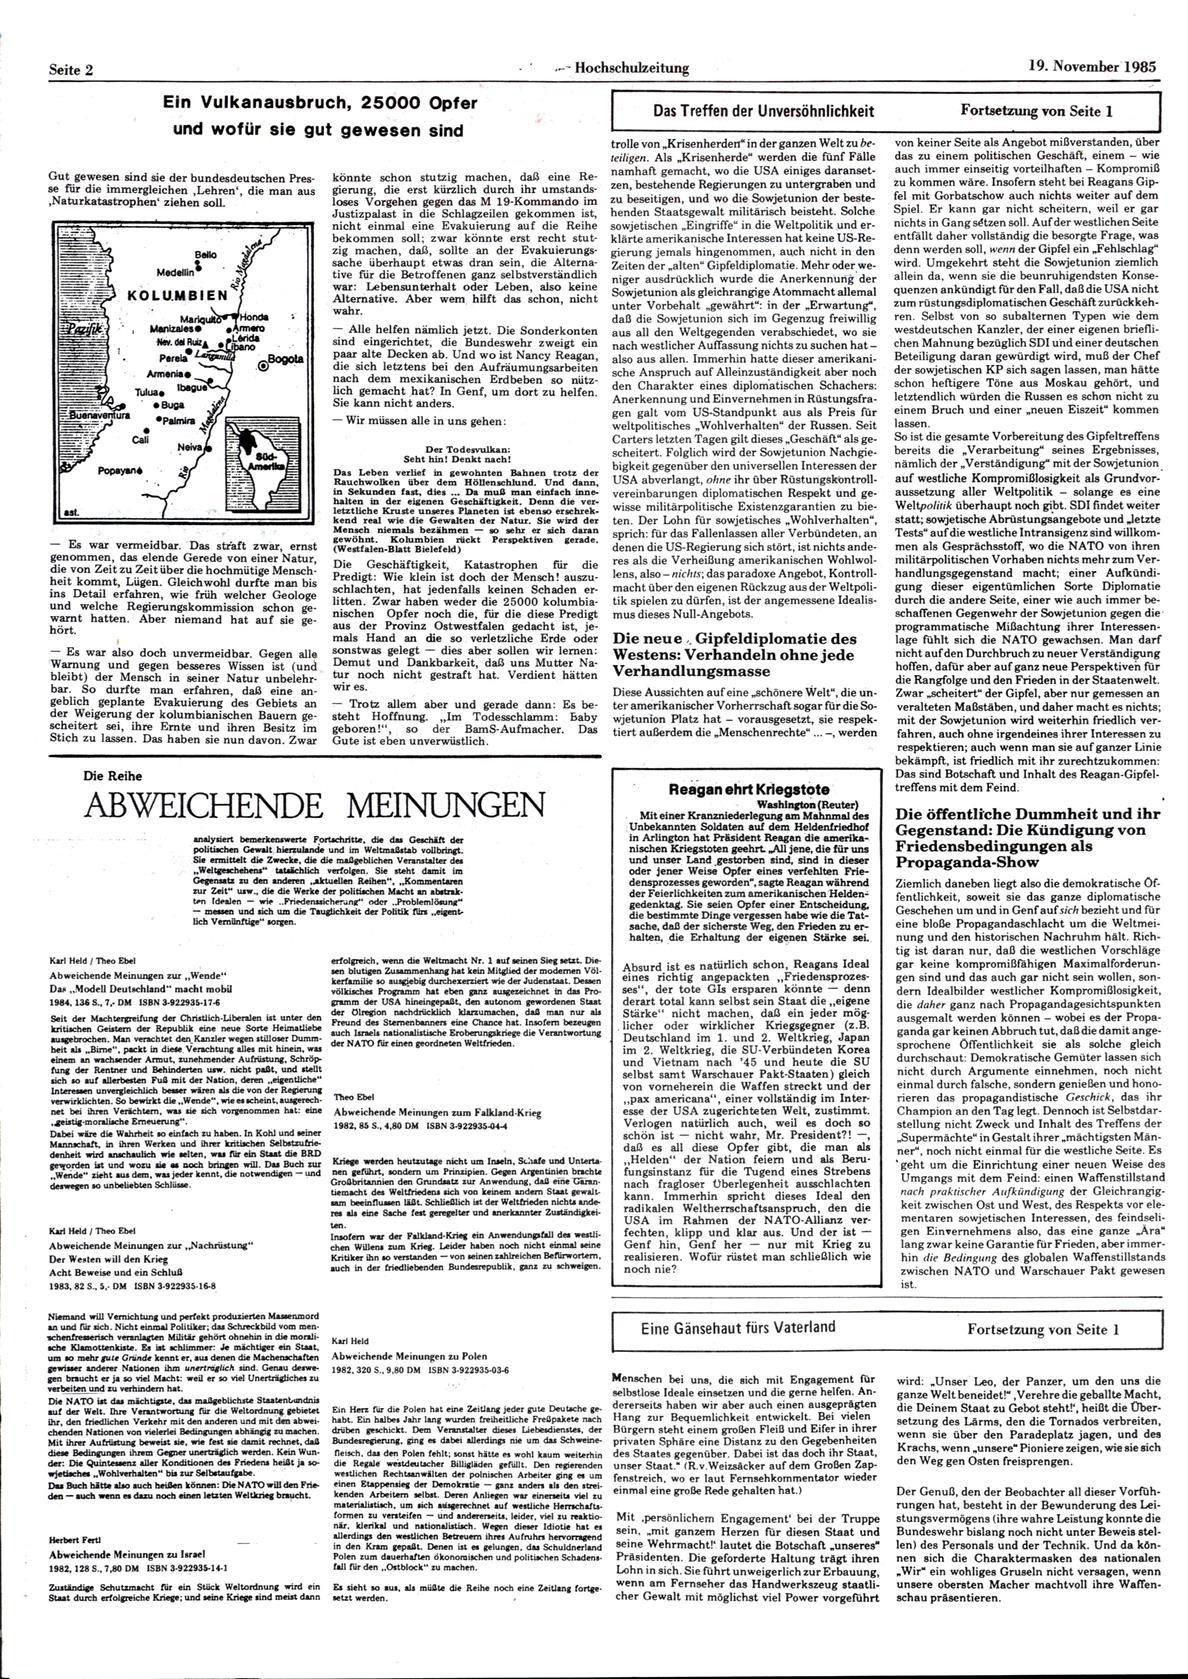 Bochum_BHZ_19851119_119_002